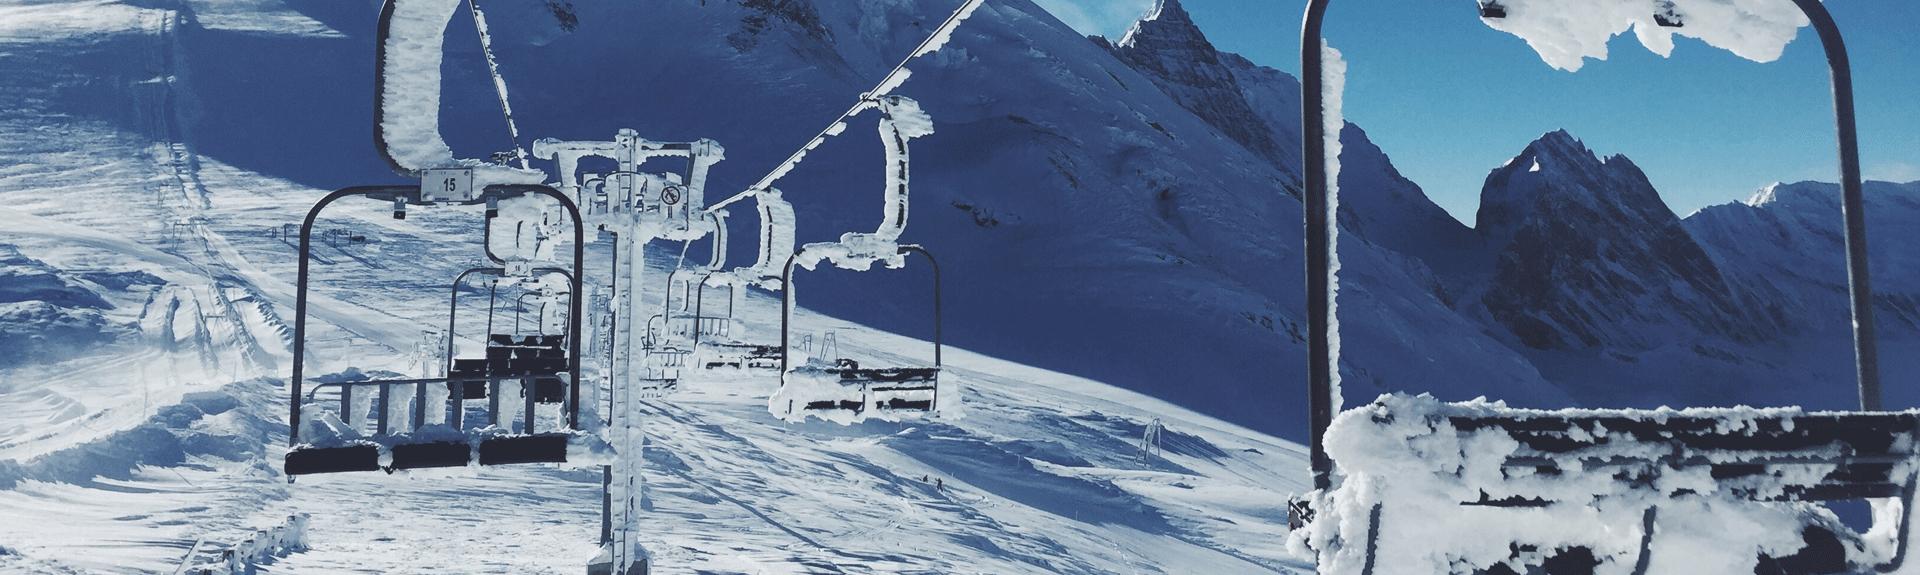 ski-list-1920×575